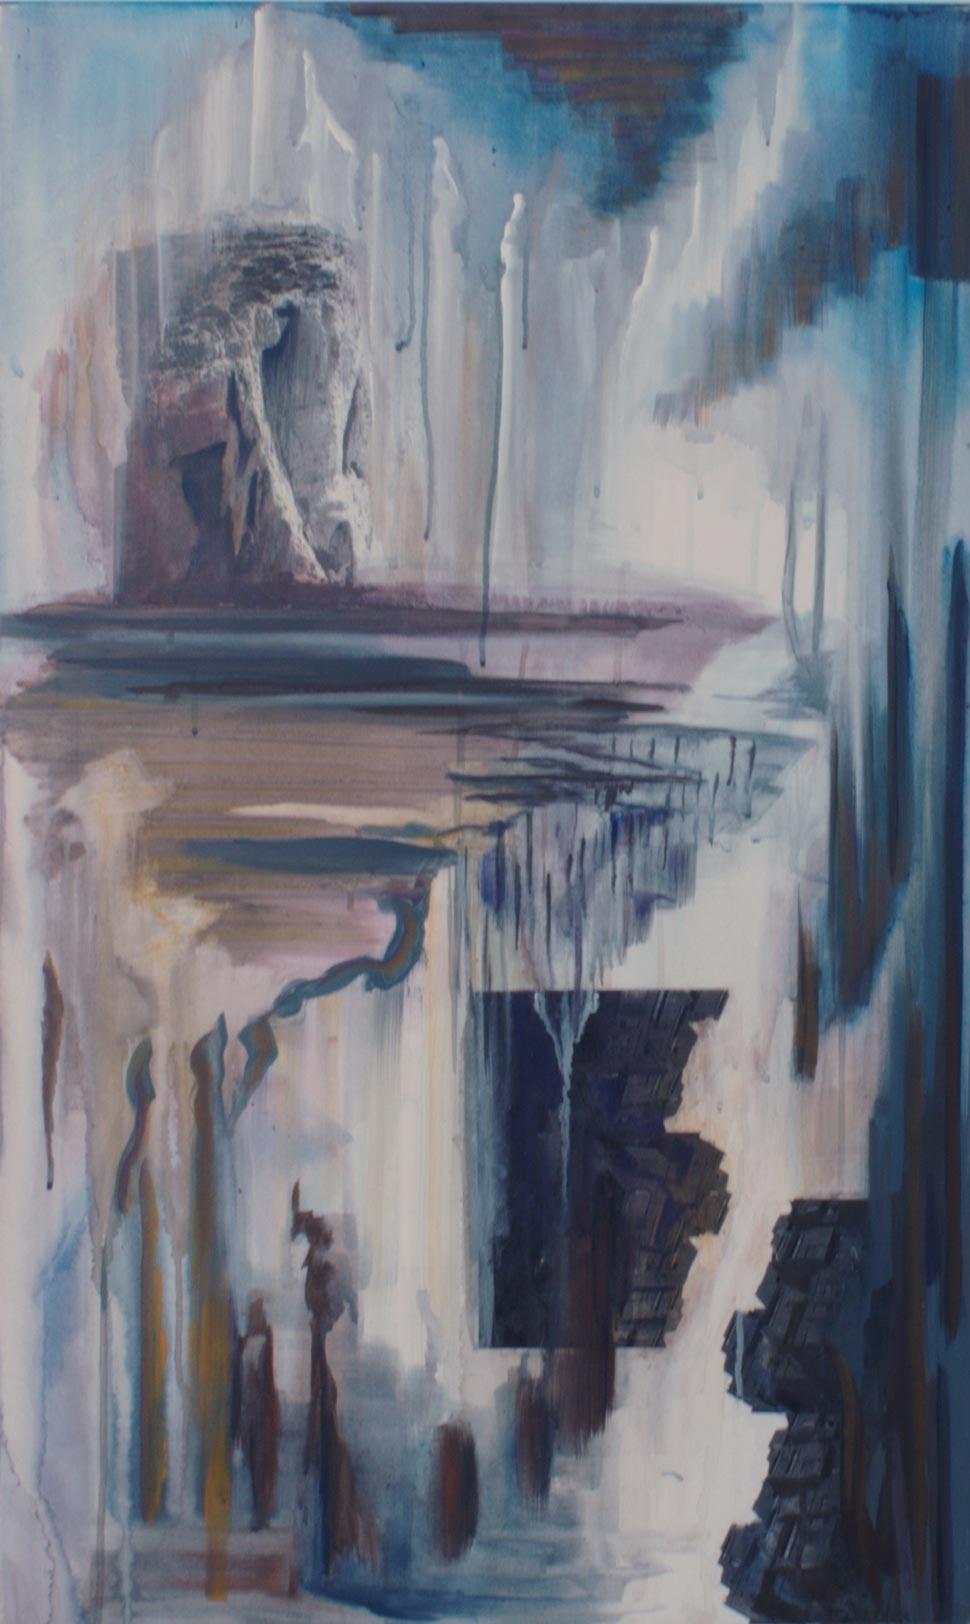 Joanne Ho - Beneath the Depths